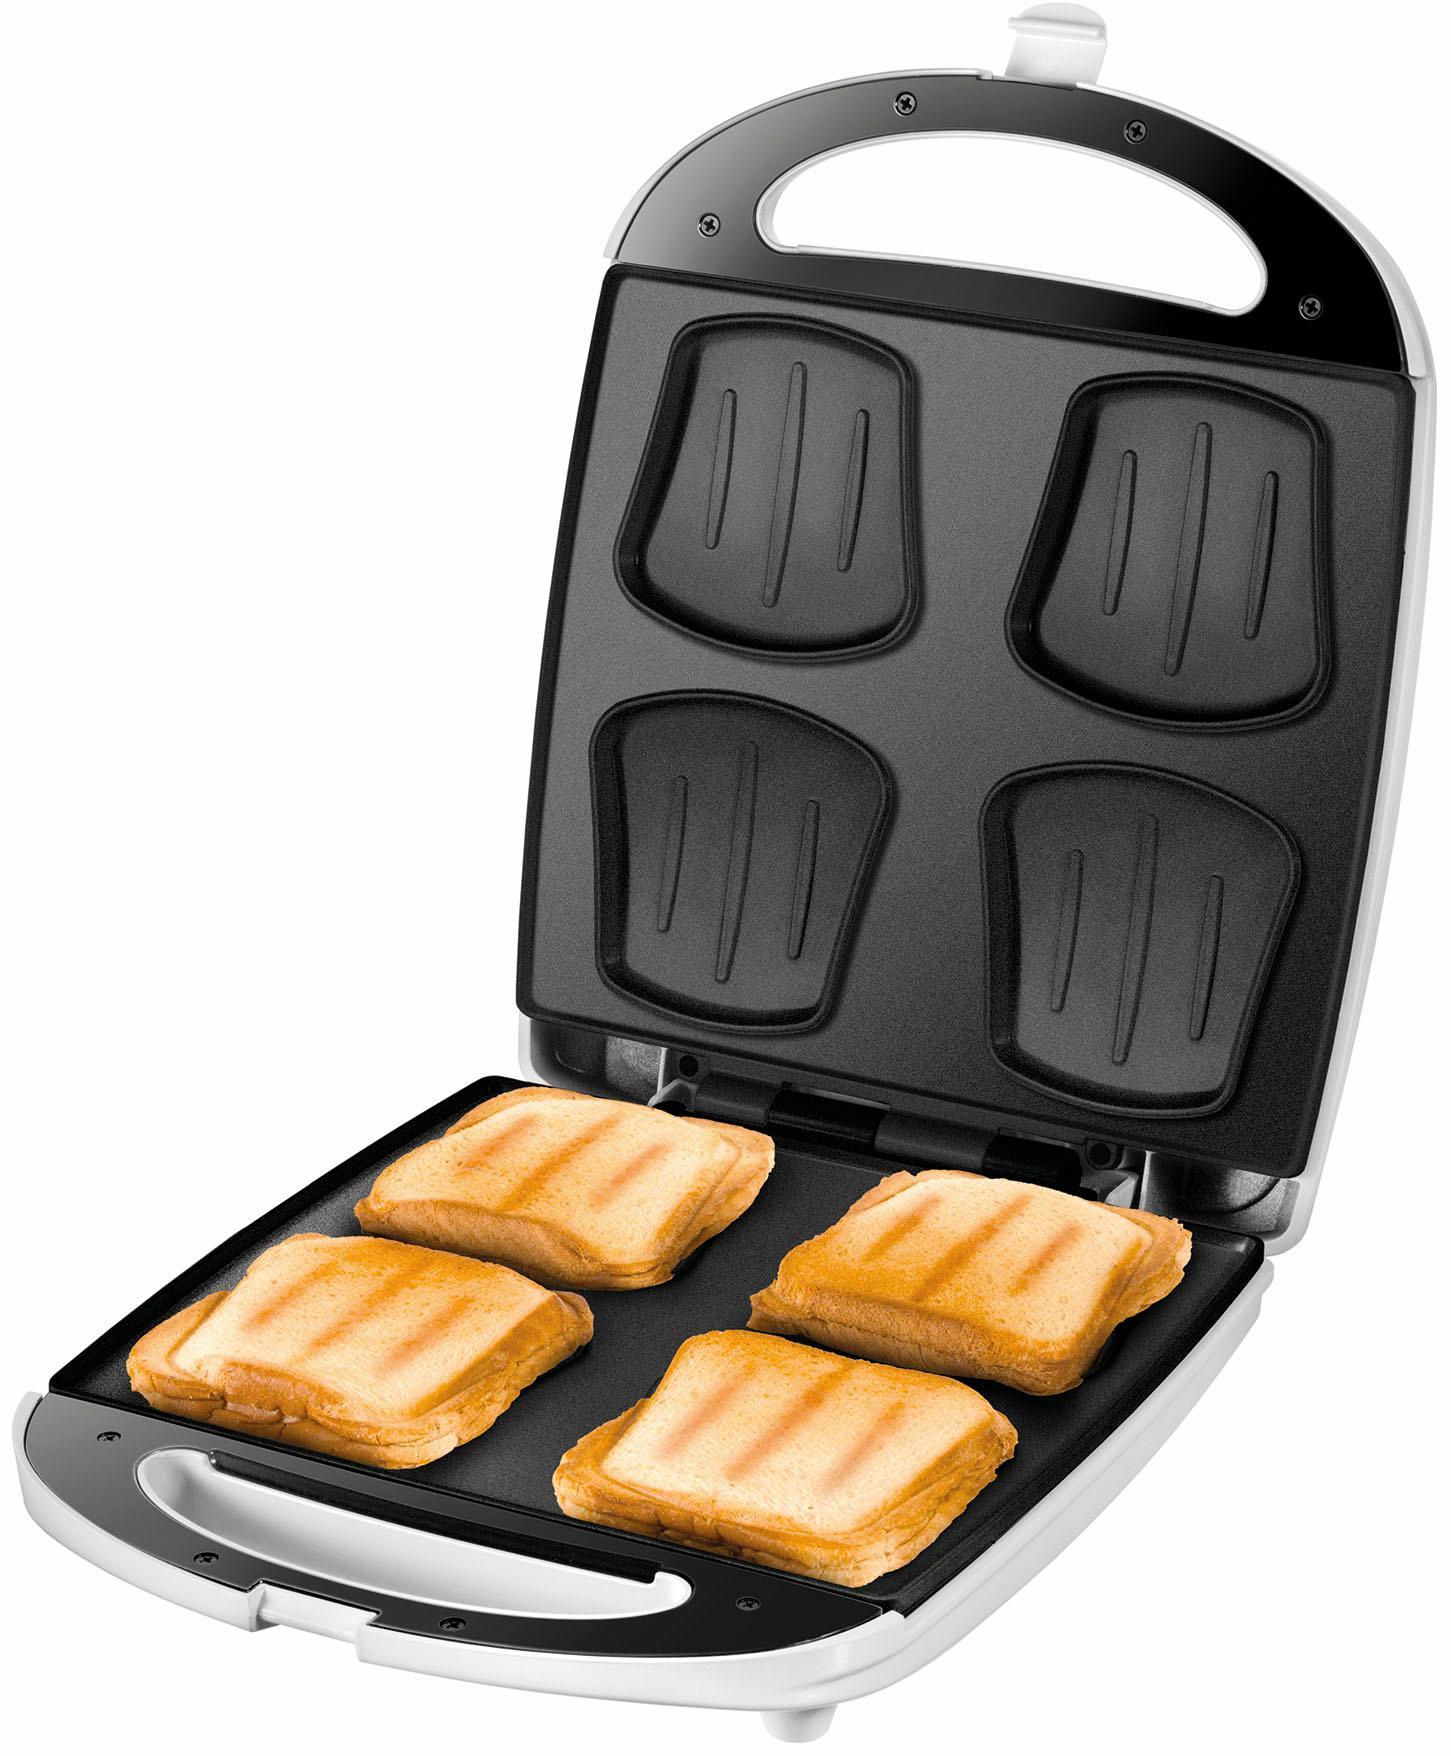 Sandwichmaker Quadro 48480, 1100 Watt